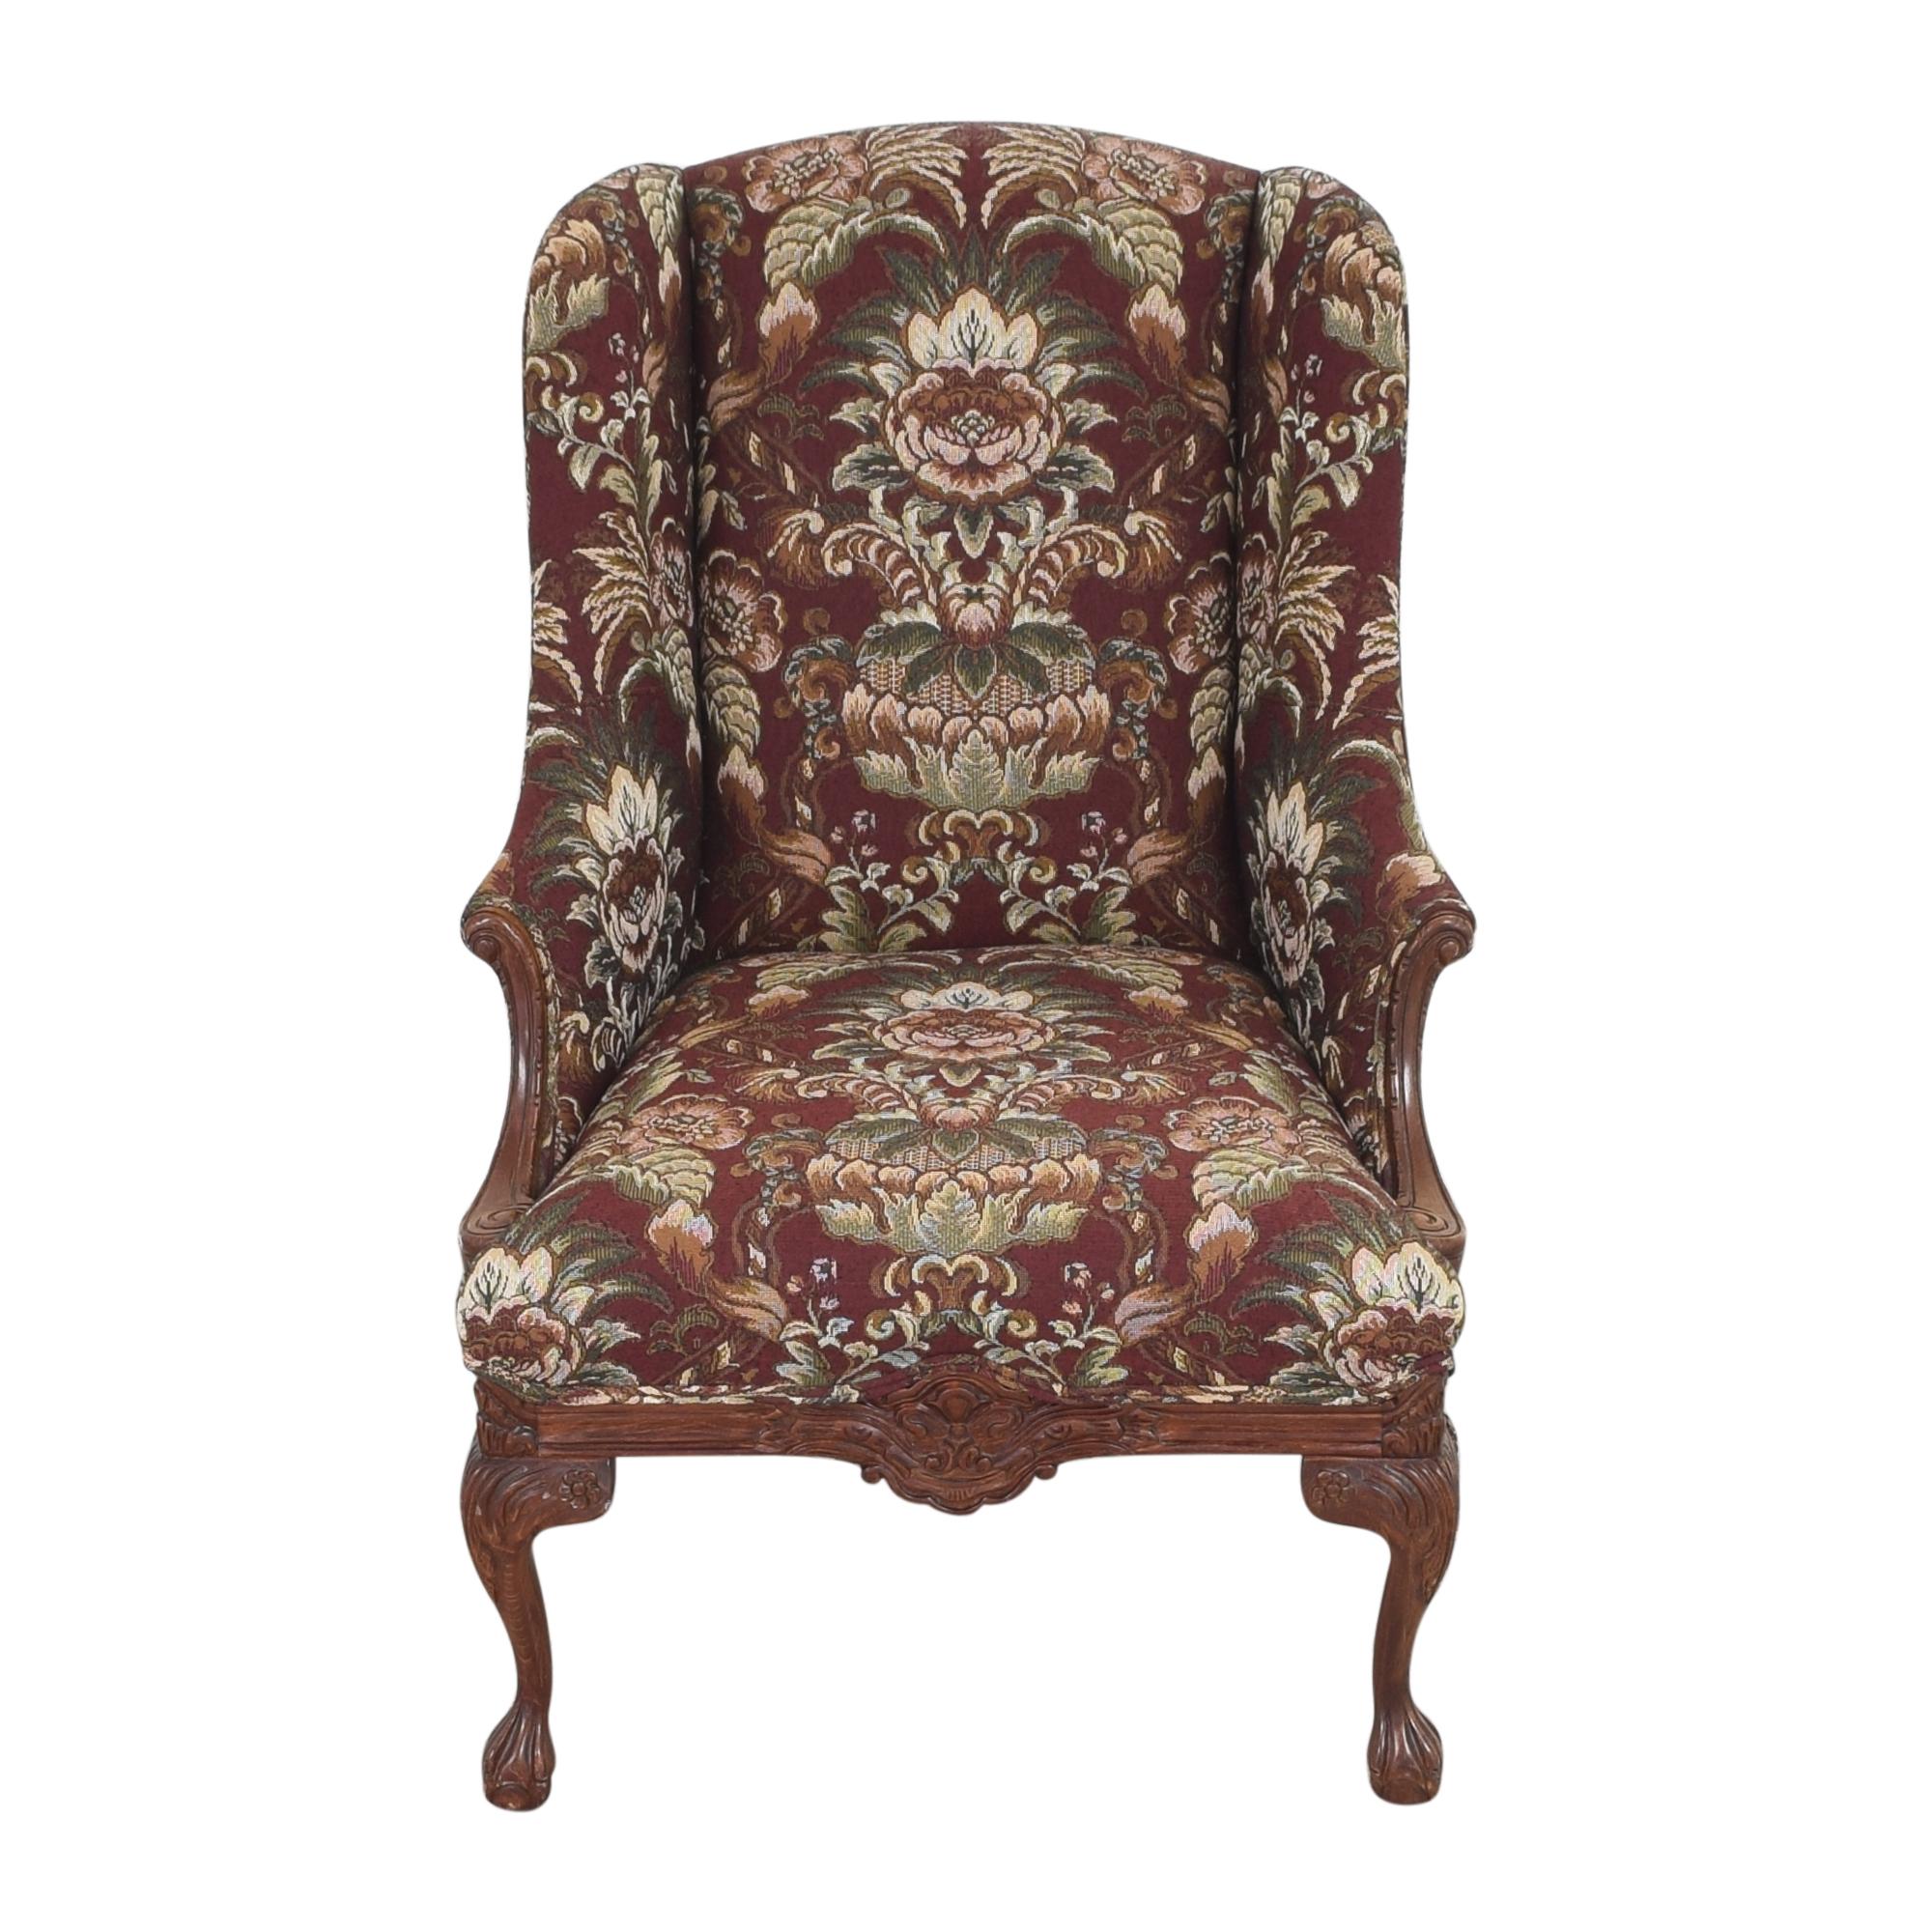 shop Drexel Heritage Drexel Heritage Wing Back Floral Chair online